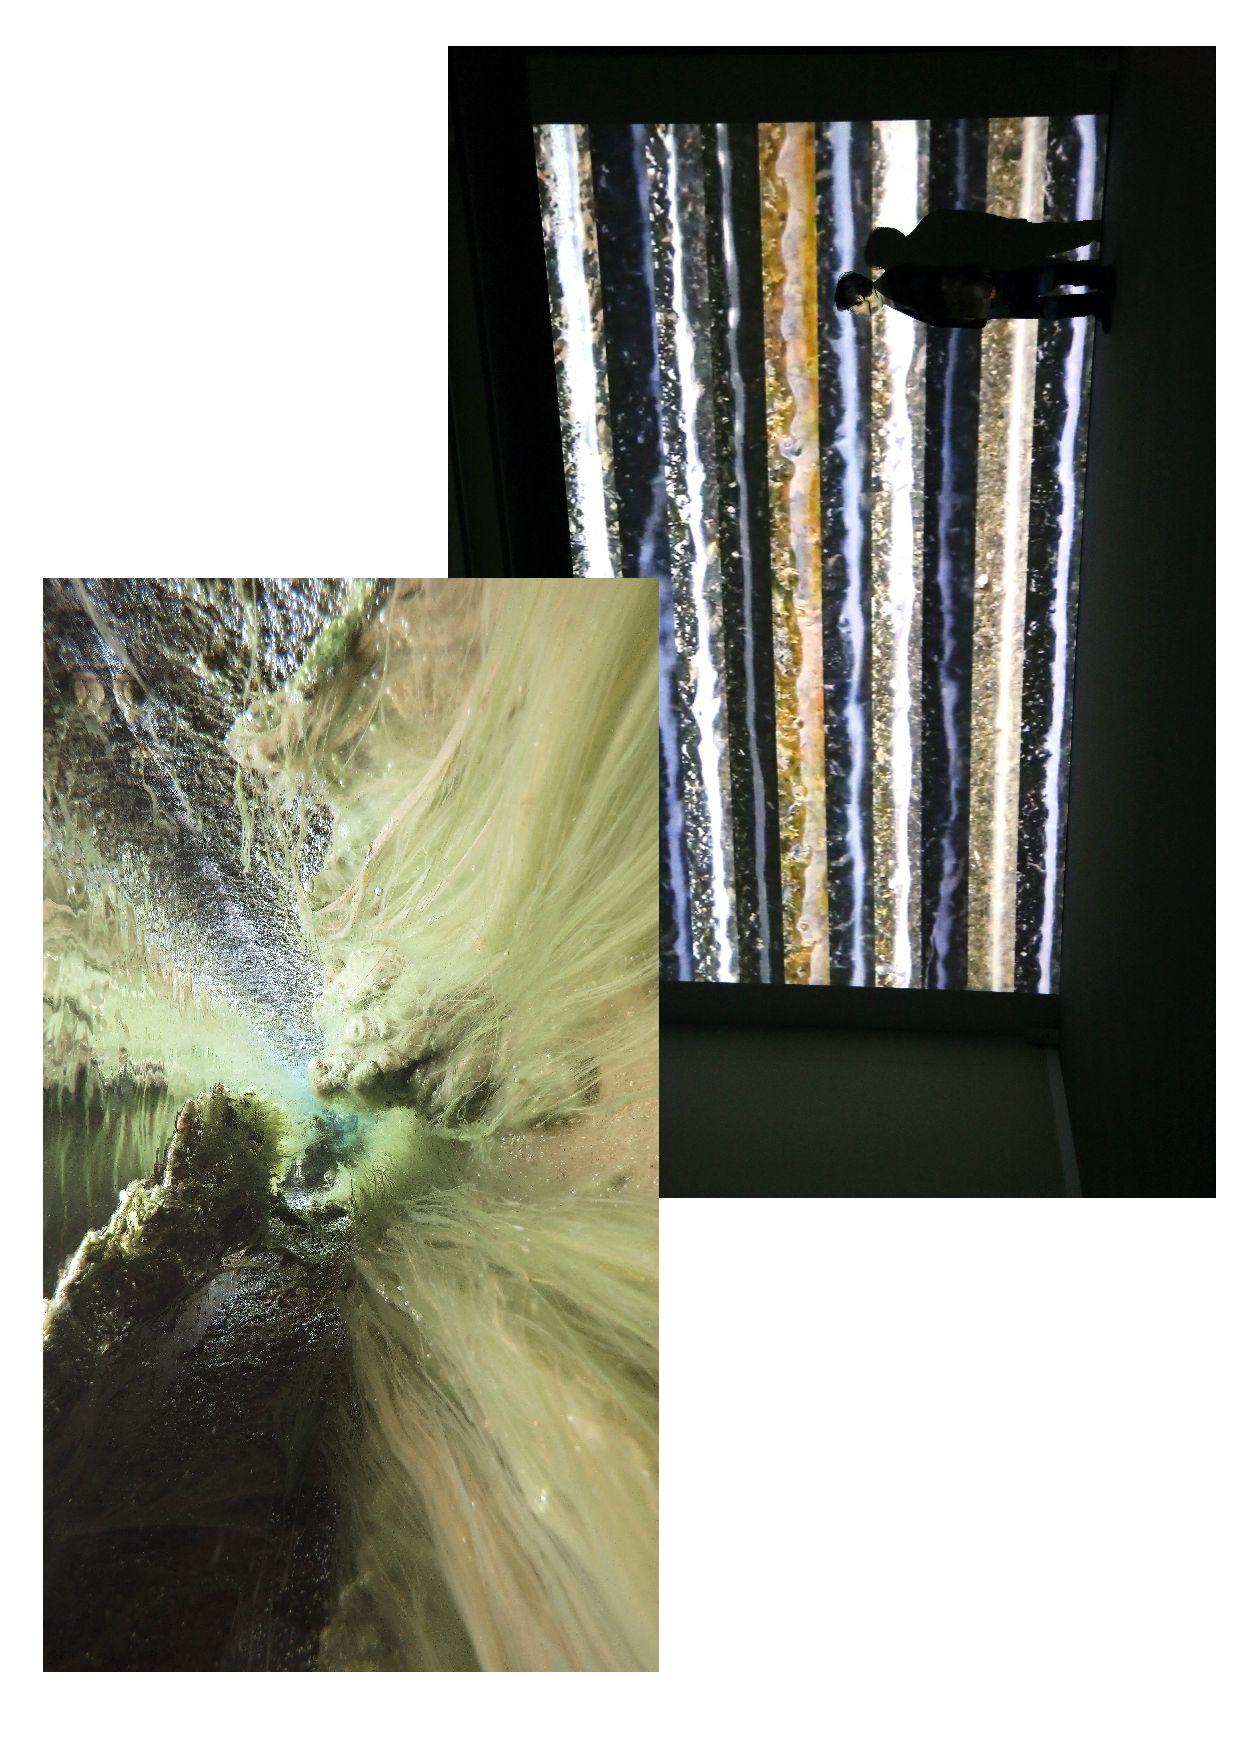 (1) Кадр из«The Stream VIII» (2018). (2)«The Stream II» на показе в«Aqua Passage,Shiga Citizens». Theatre for the Art